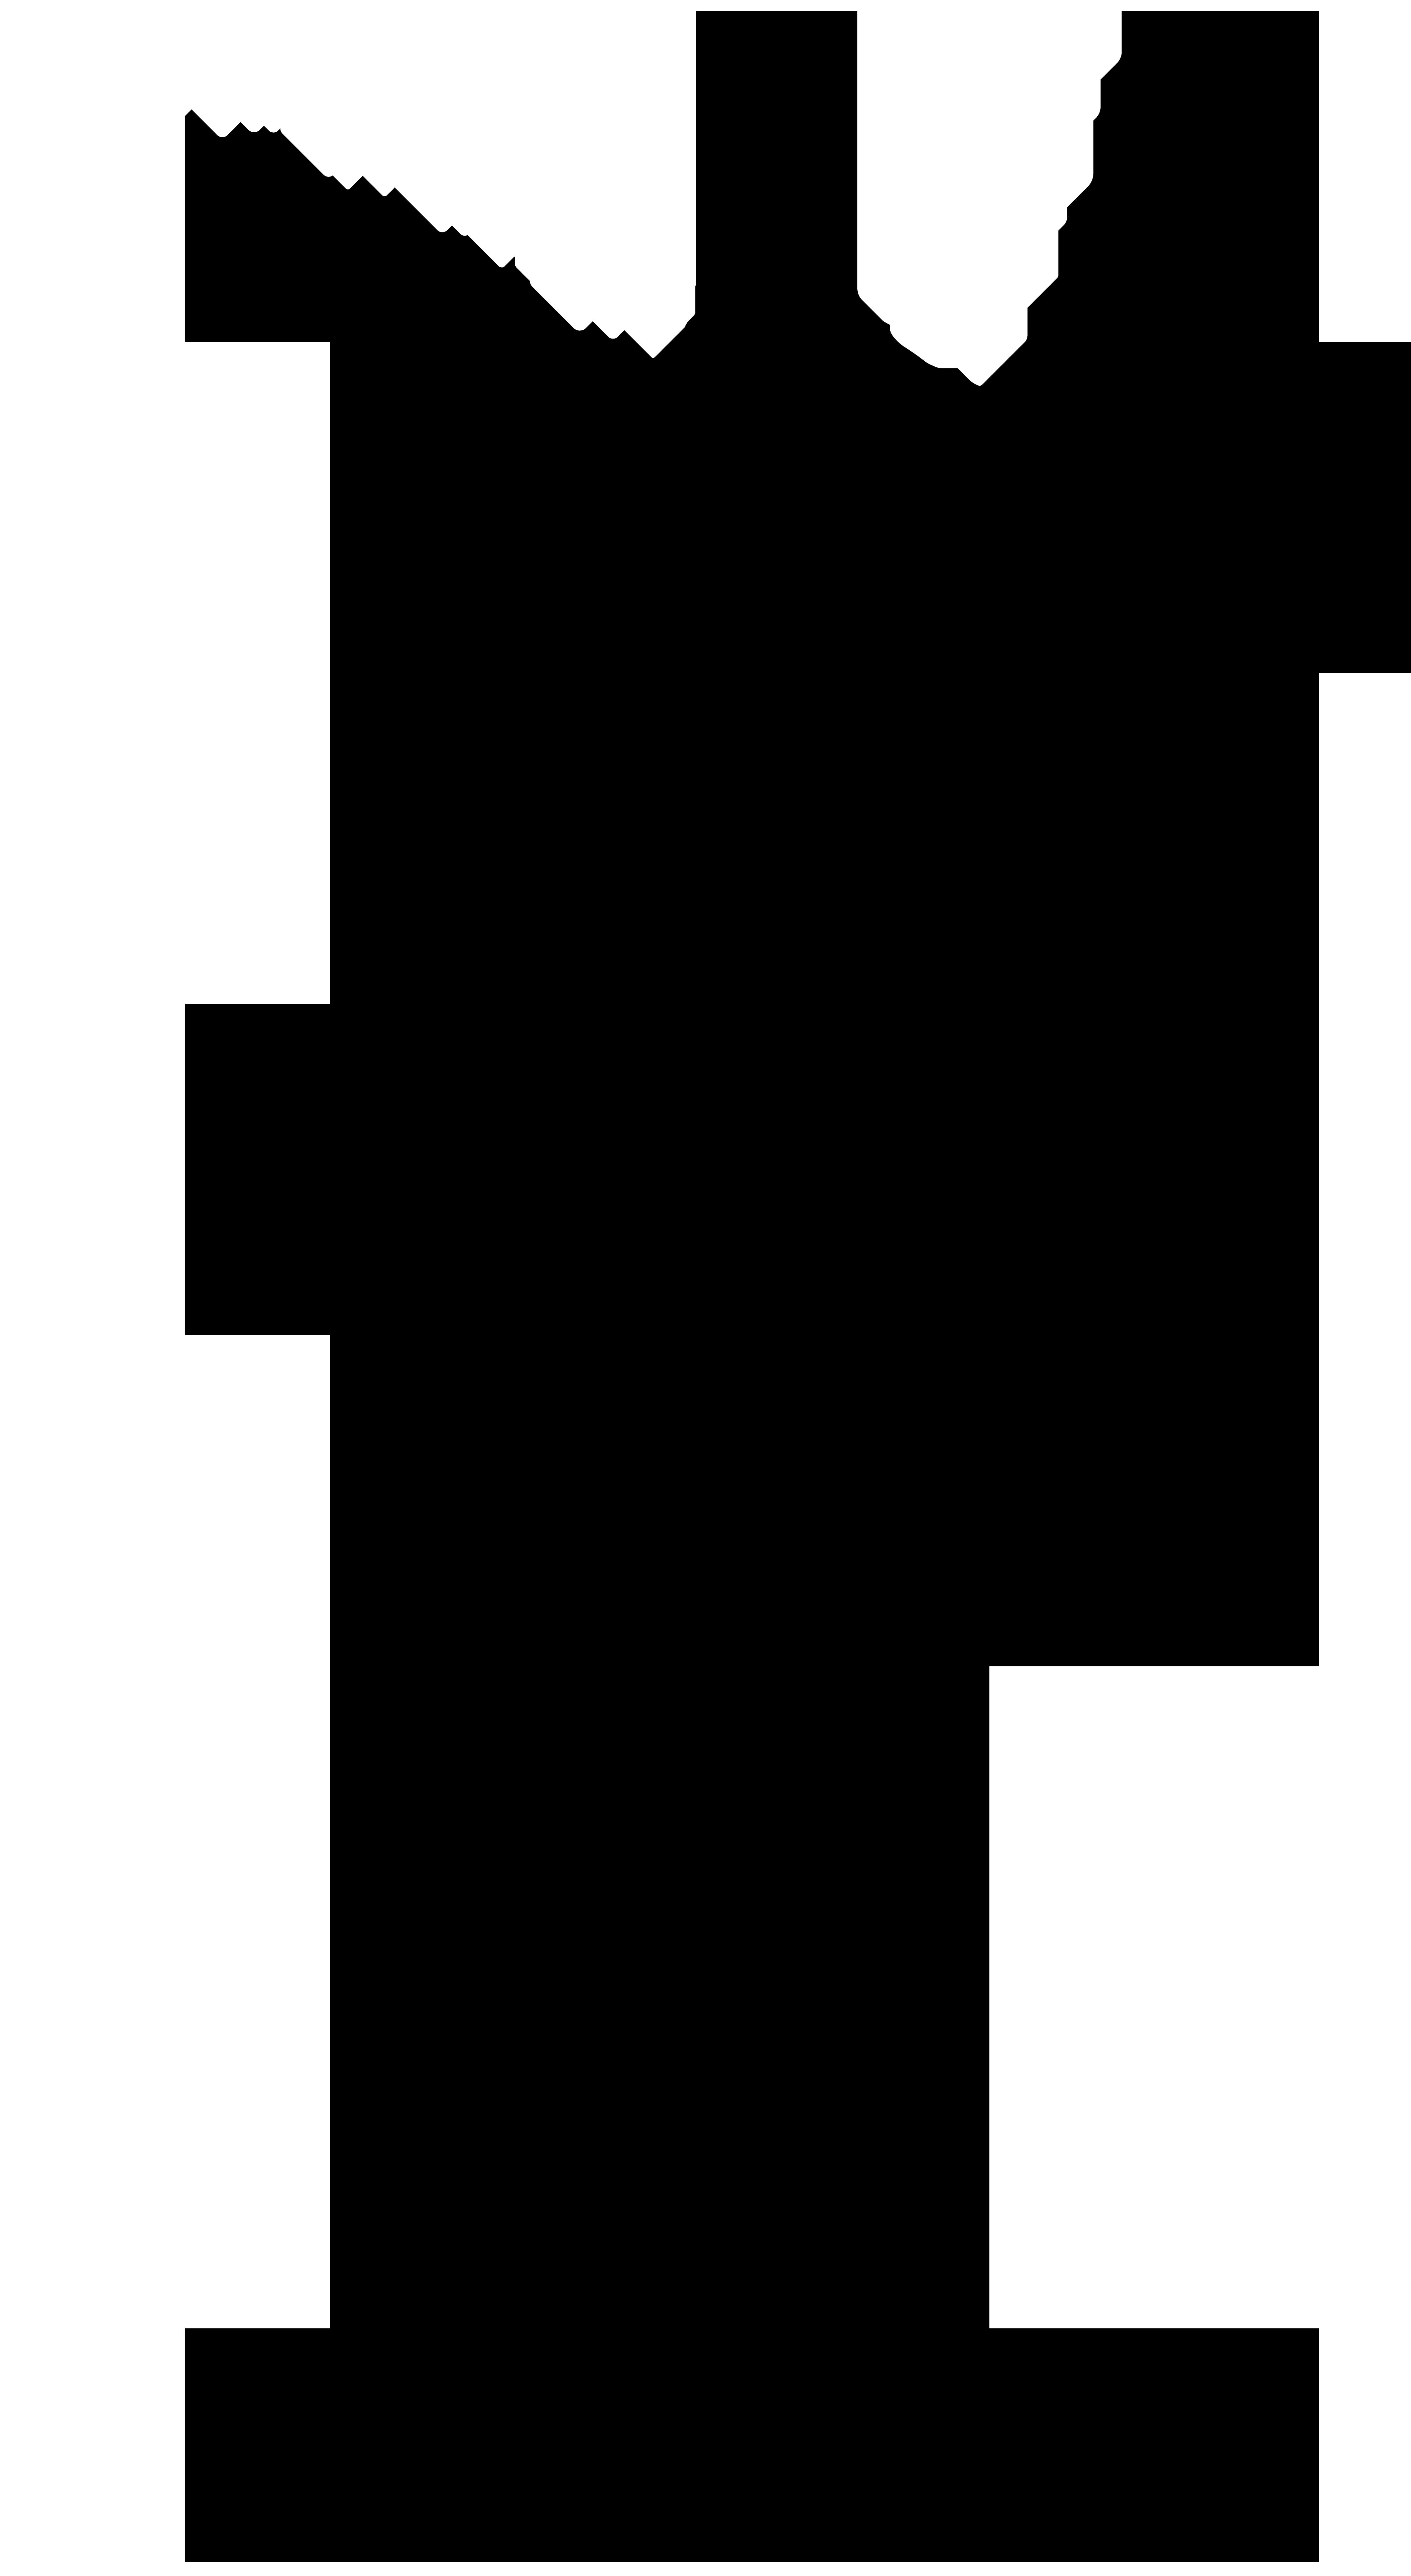 Person clipart diving. Diver silhouette png clip